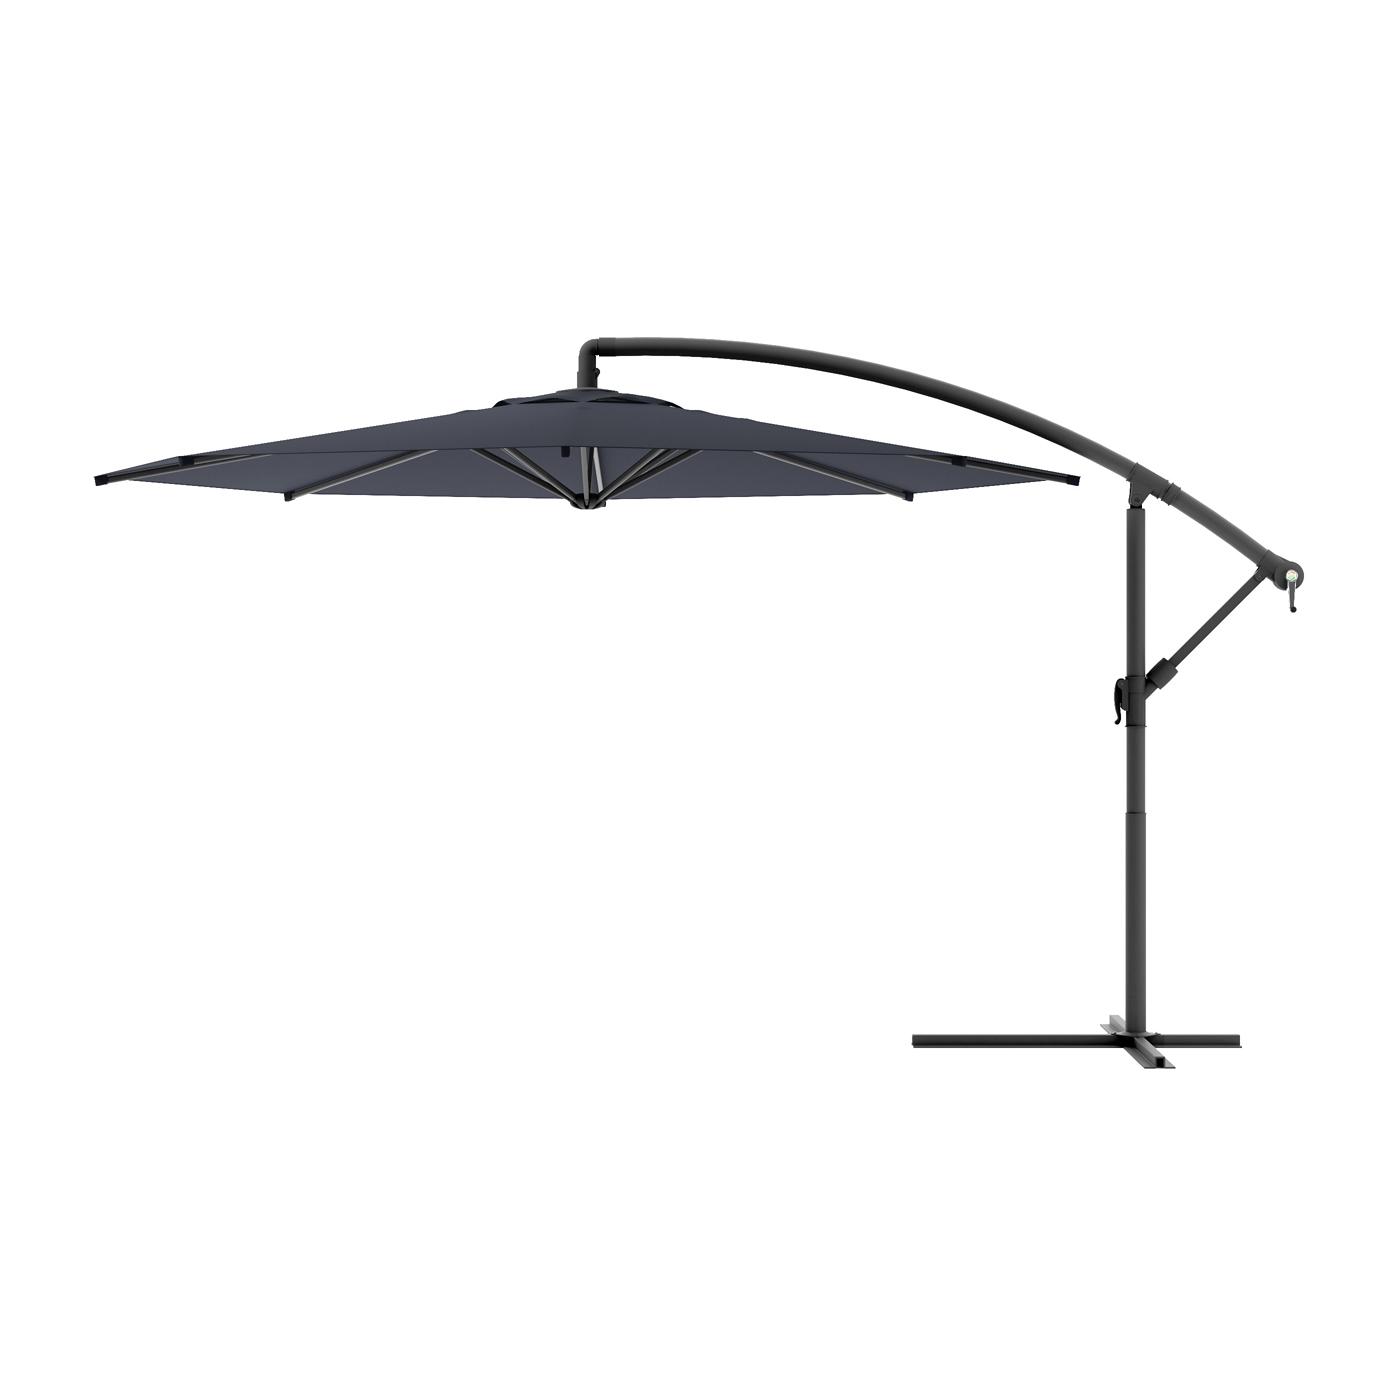 Drape Patio Umbrellas Inside Recent Patio Umbrellas (Gallery 9 of 20)